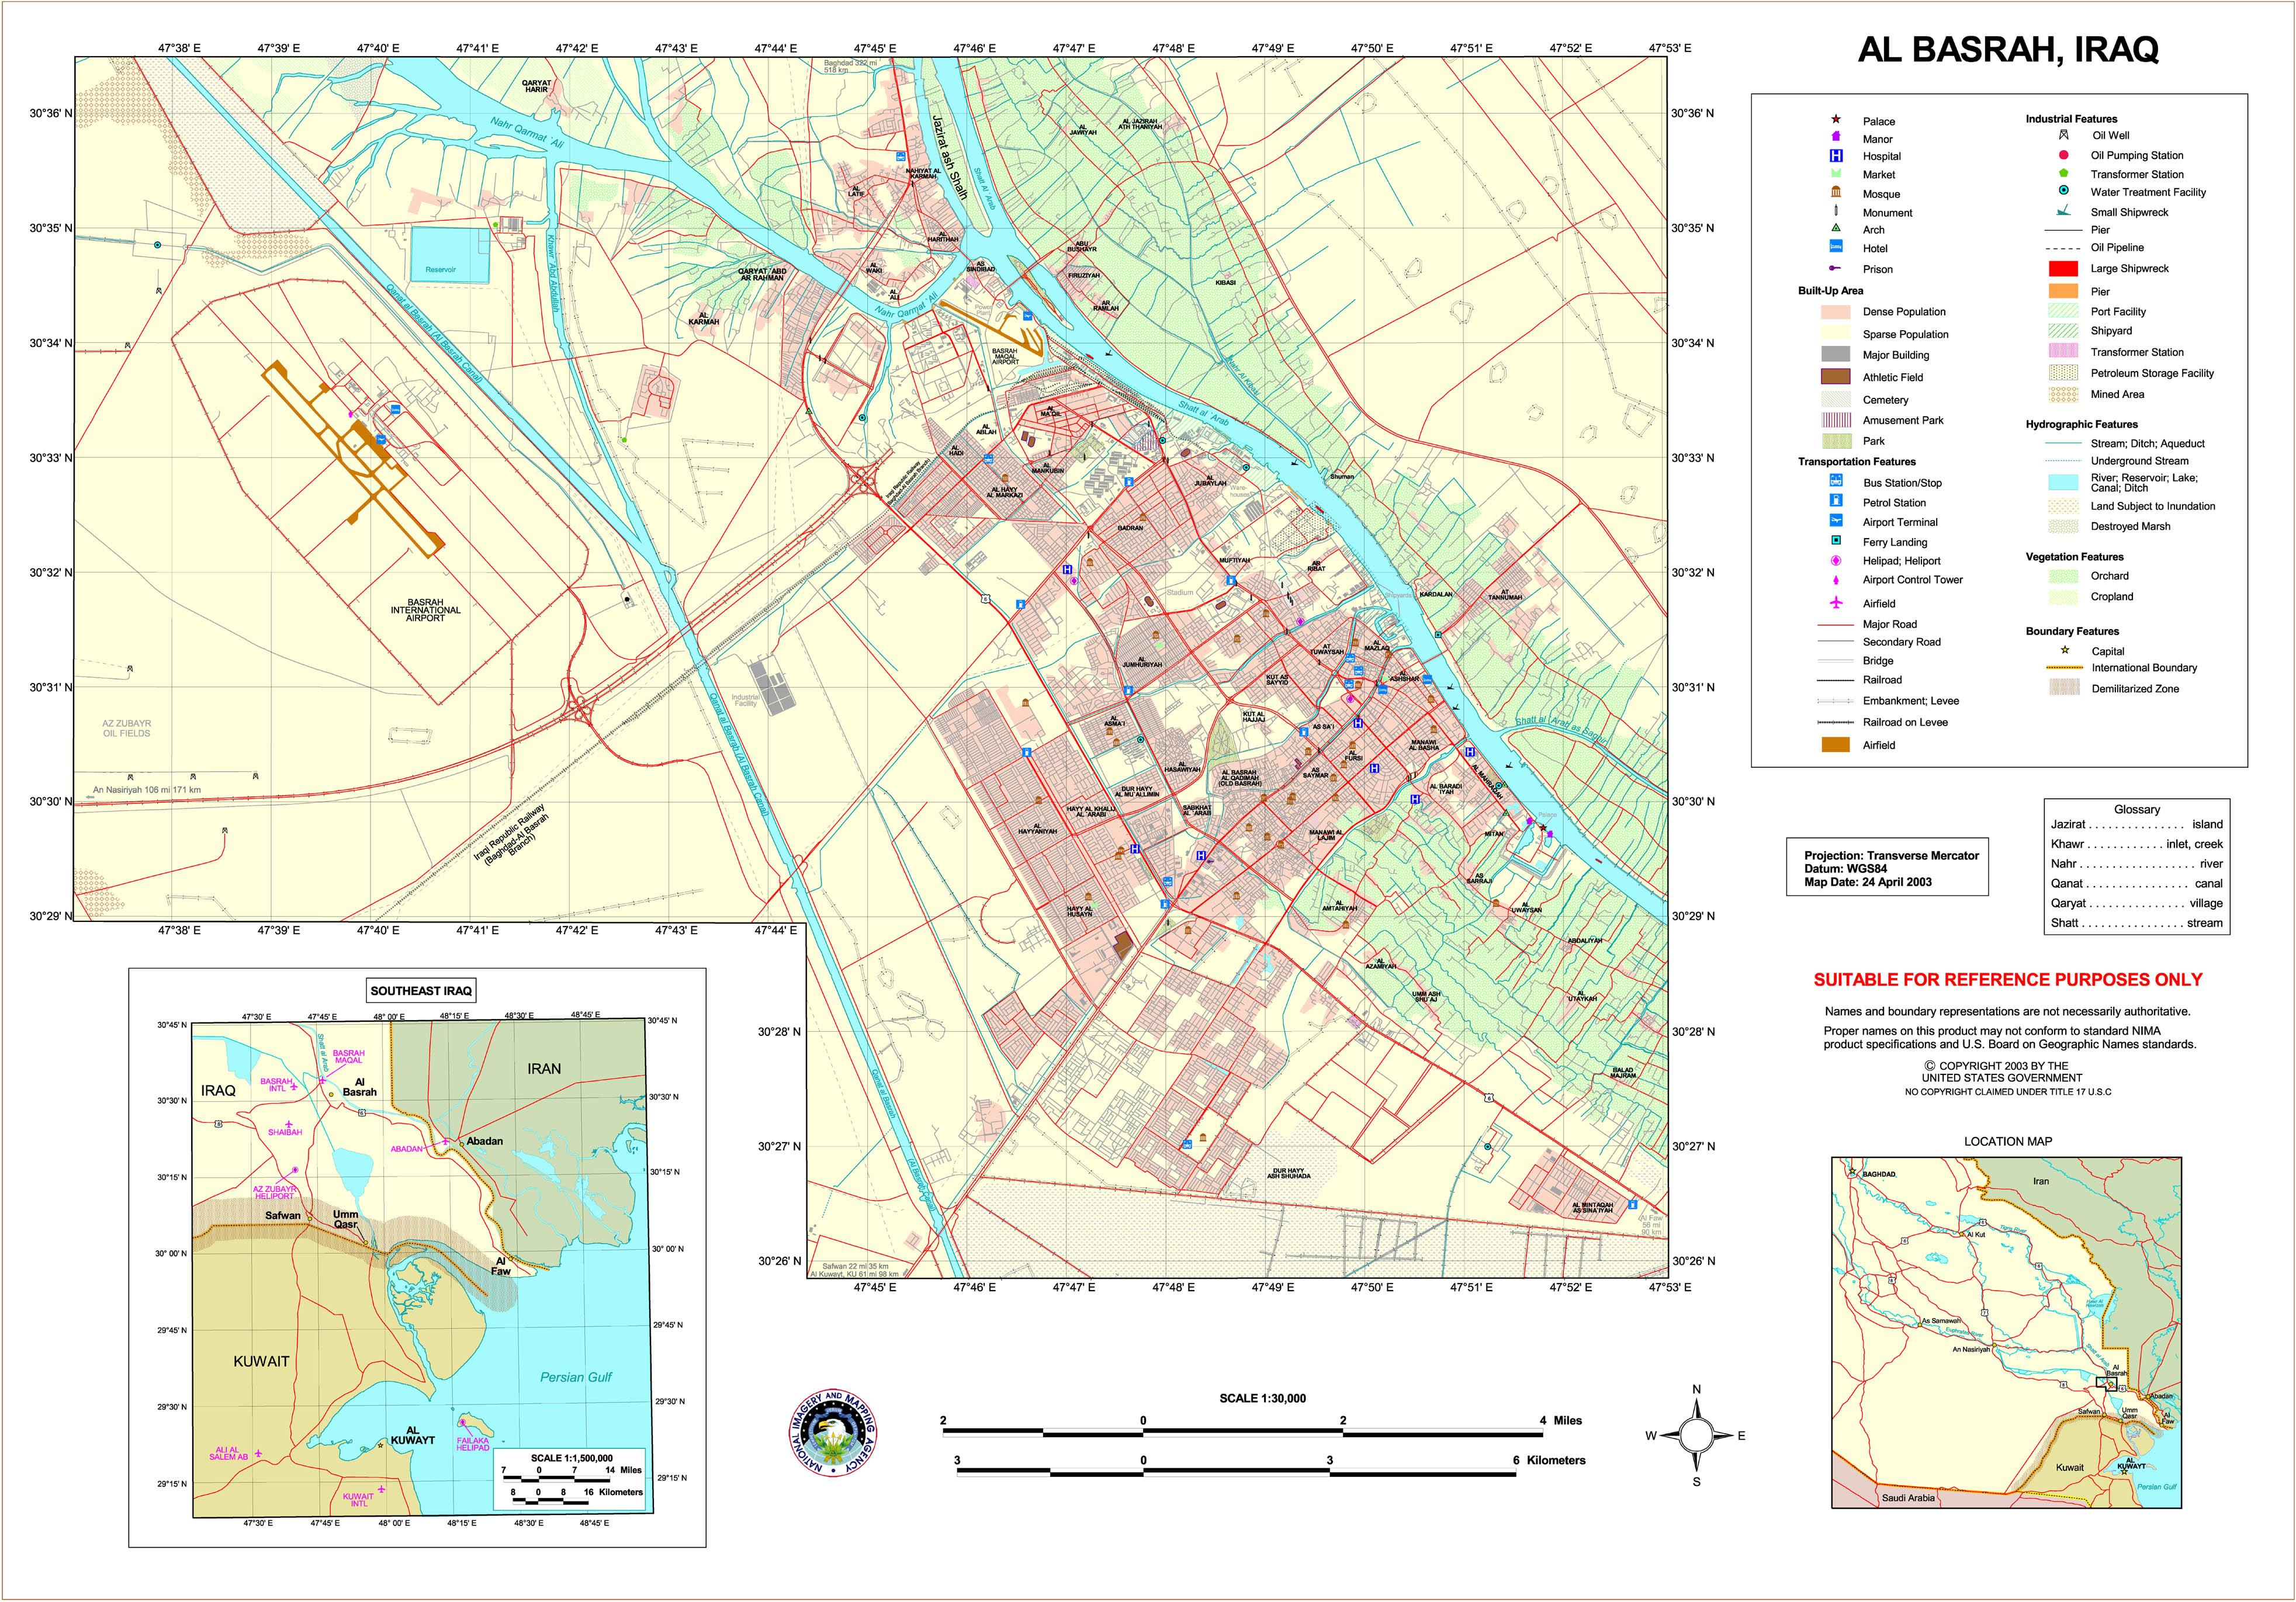 Basra map 2003